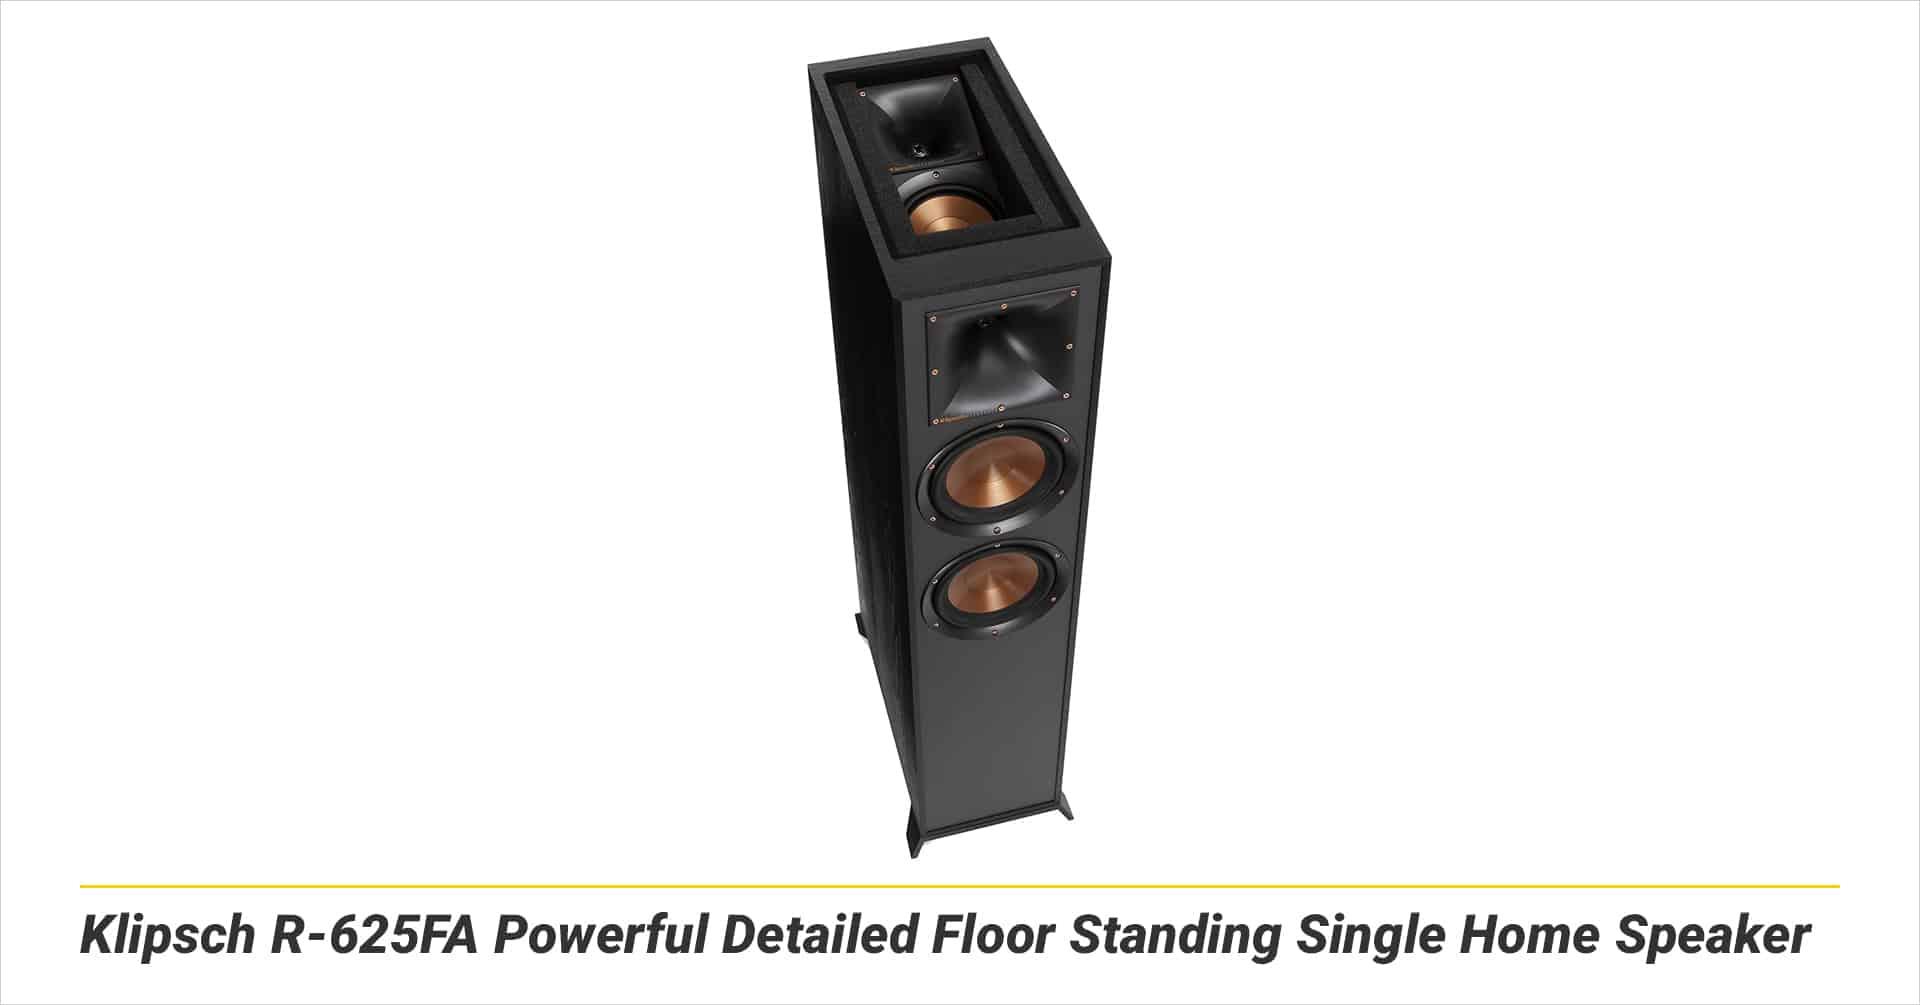 Klipsch R-625FA Powerful Detailed Floor Standing Single Home Speaker